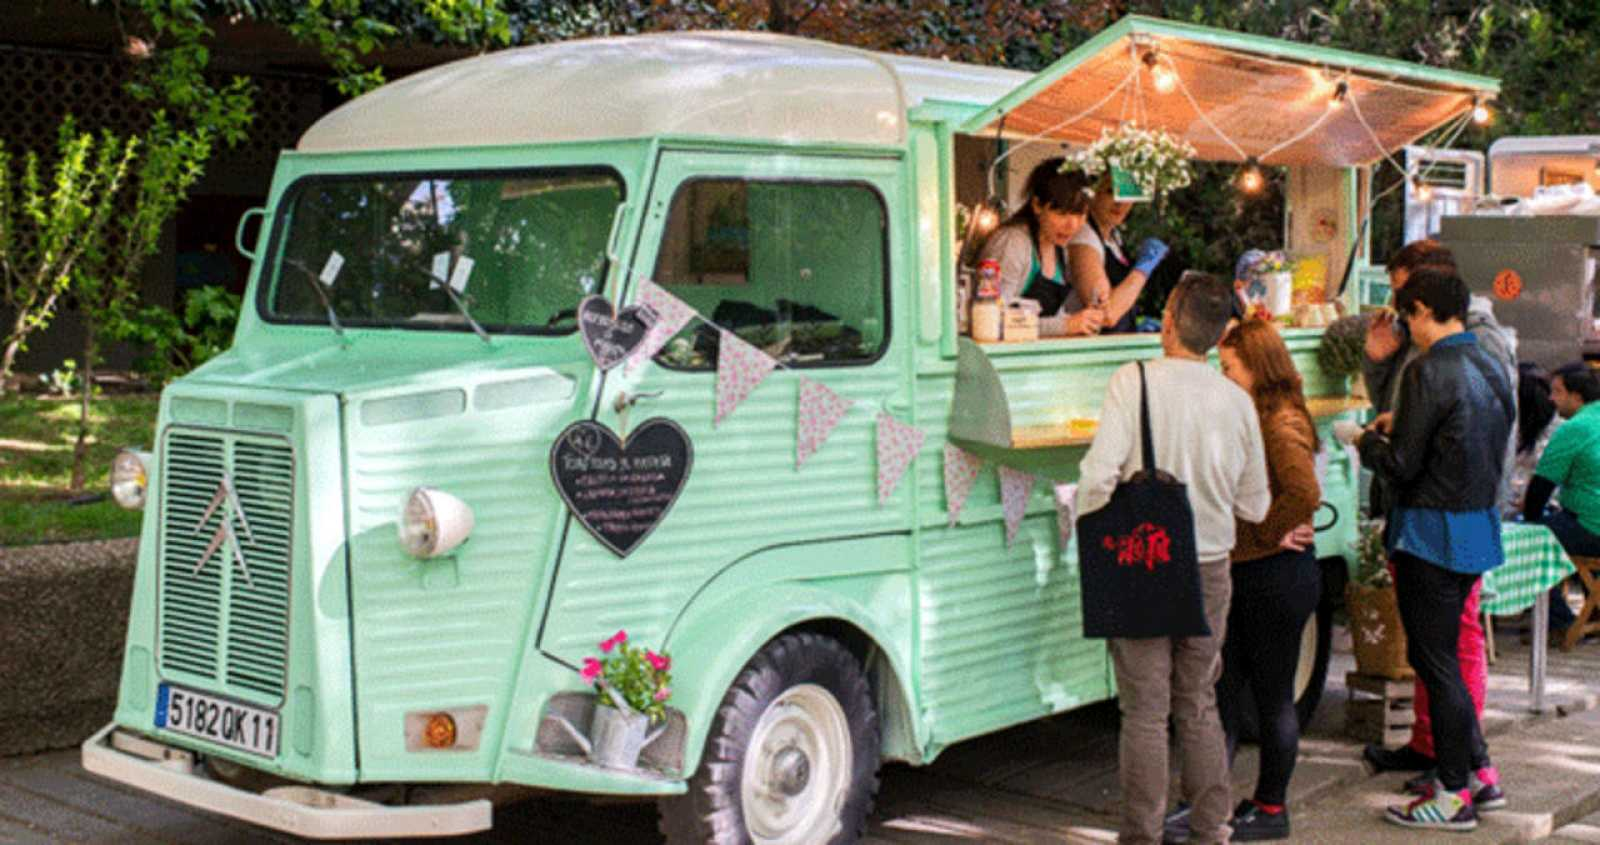 Un 'food truck' en plena venta